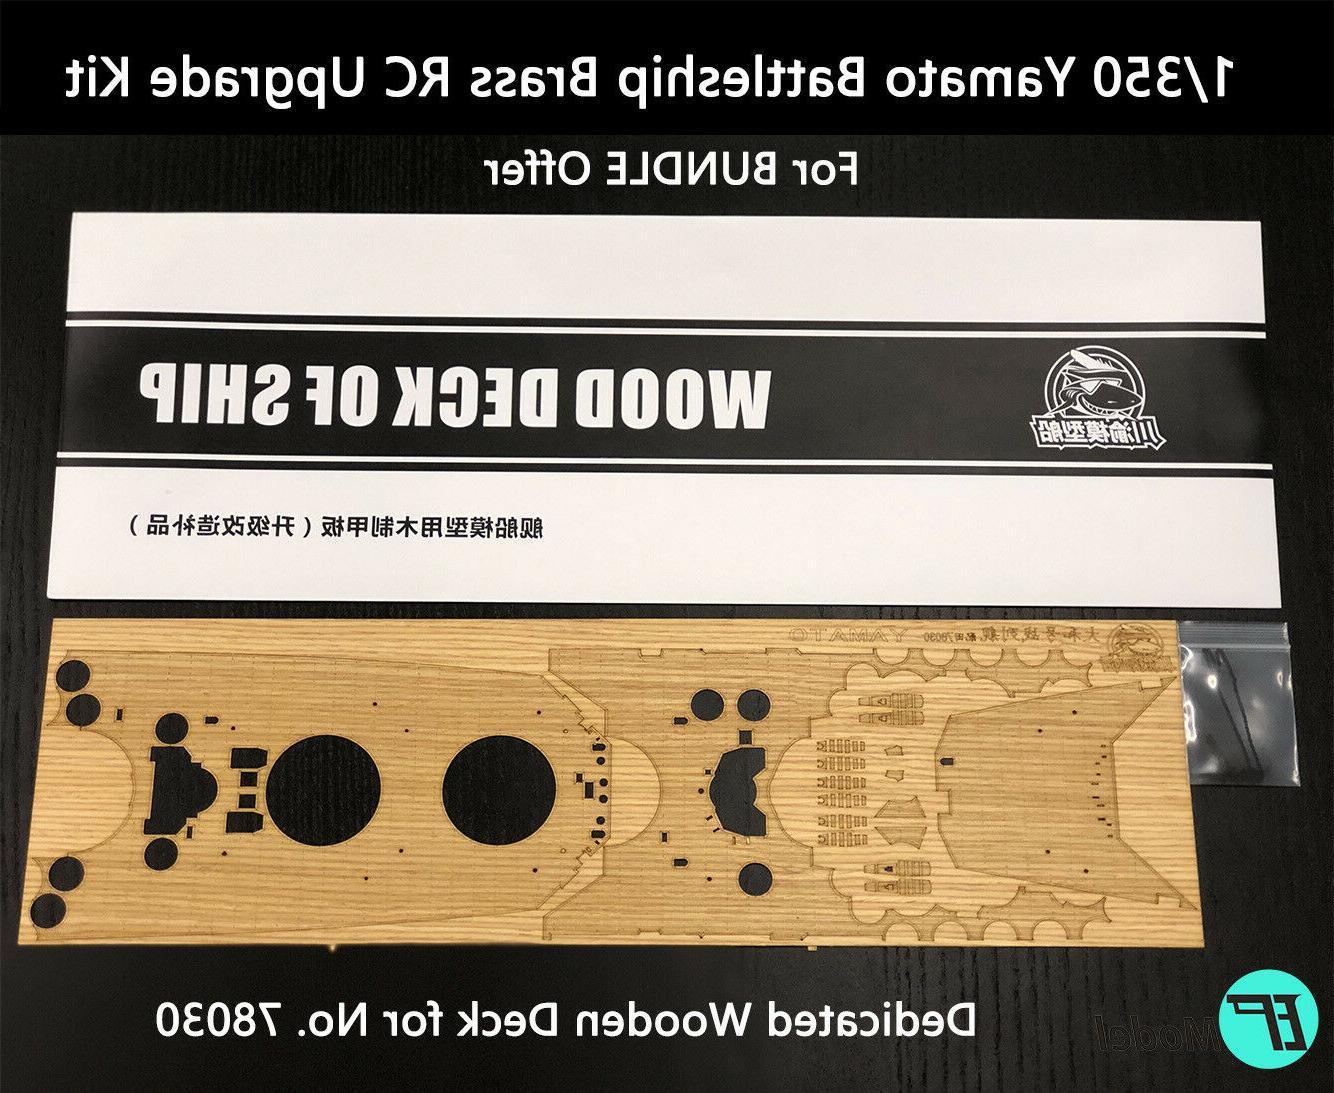 TAMIYA 1/350 Yamato Battleship Brass RC Upgrade Kit